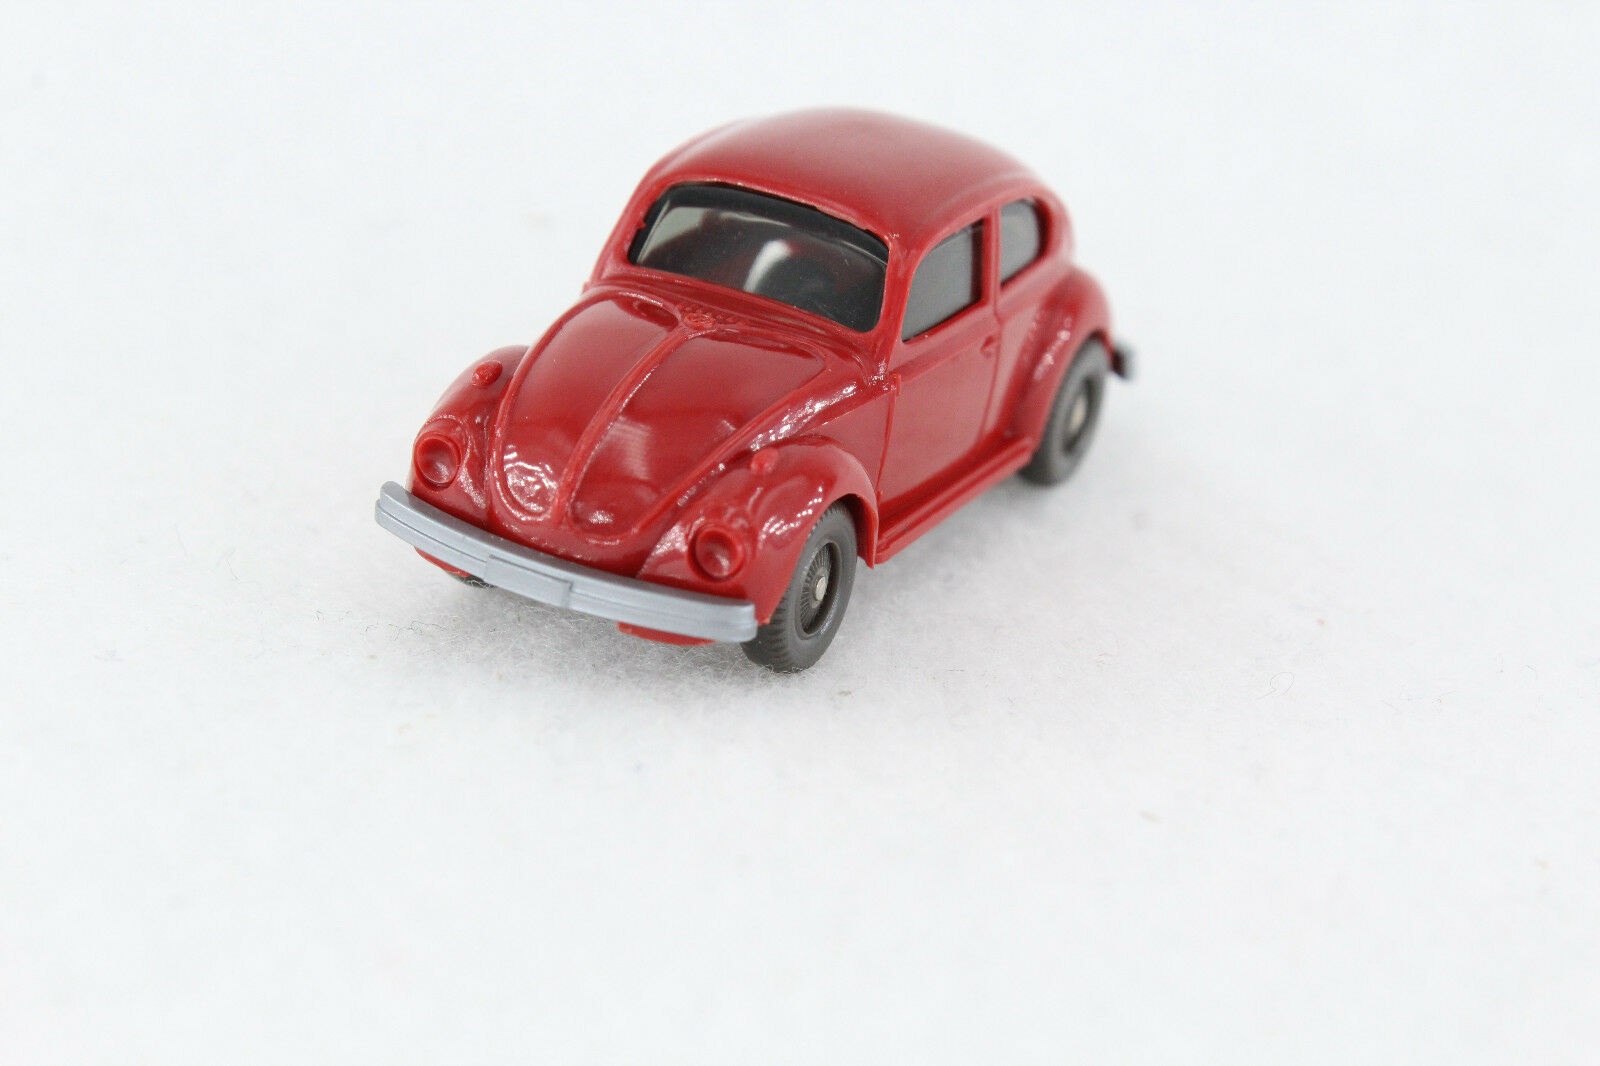 A.S.S Wiking âge VW Beetle 1300 typ6 H 'marronrouge 1974 GK 30a 3e CS 302 5b 1 WTOP